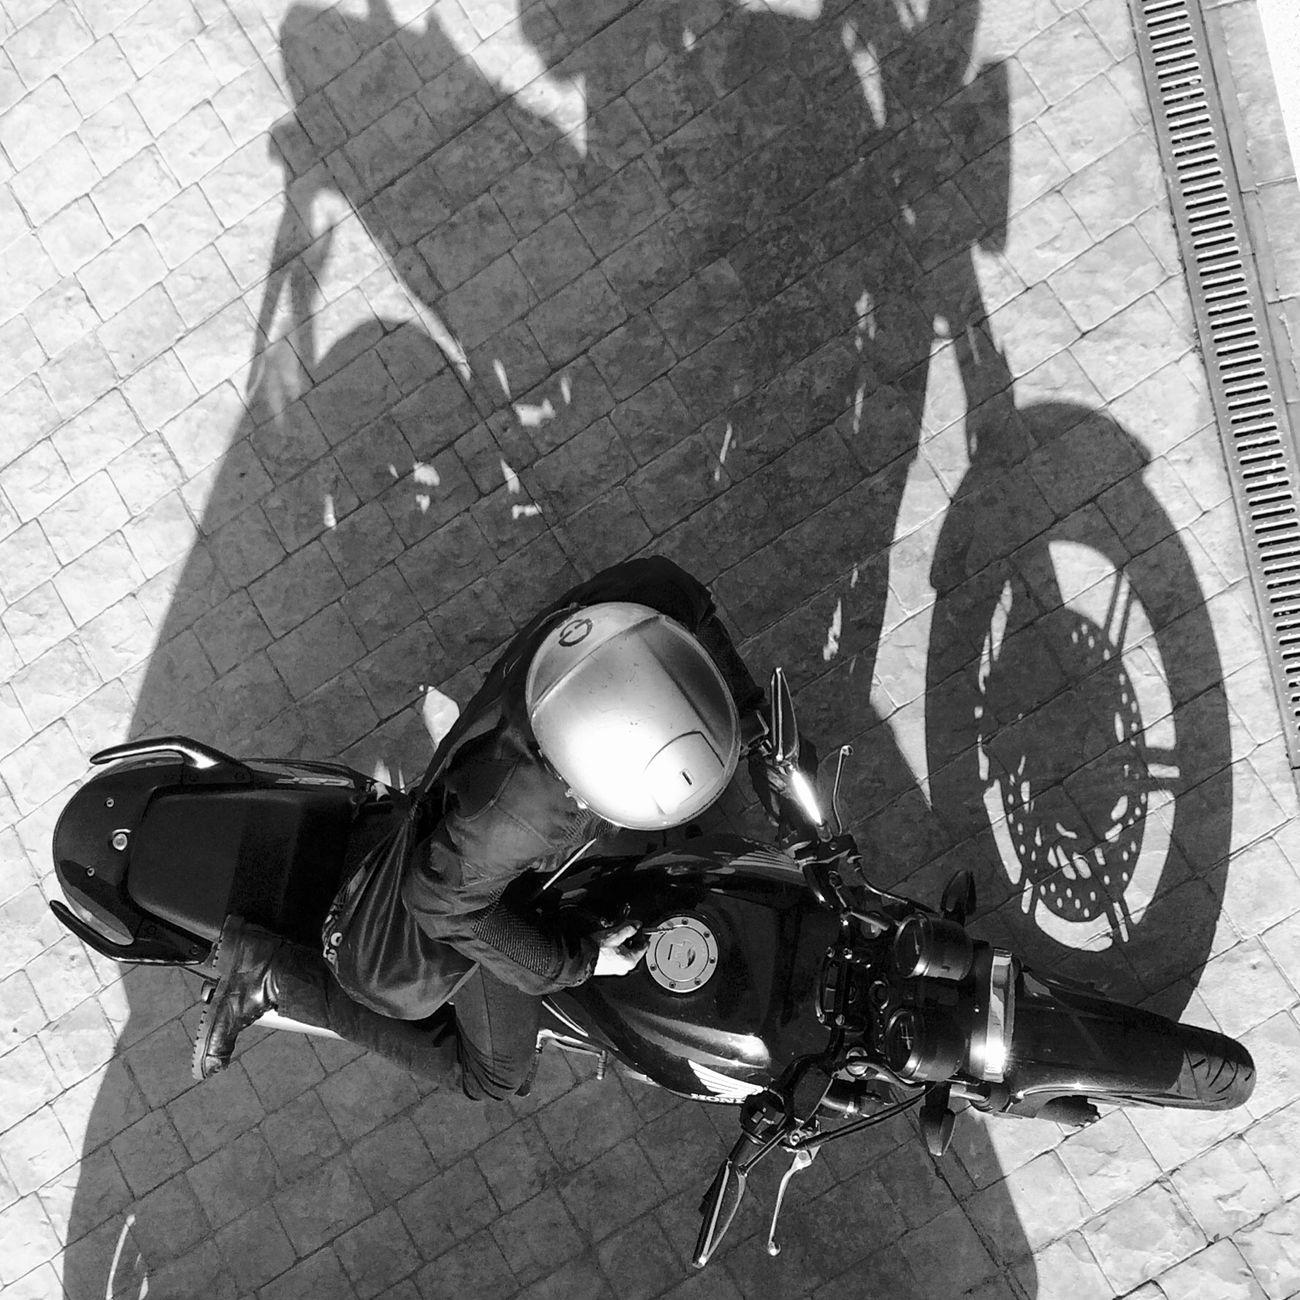 Streetphotography Motorcycles Blackandwhite Summer